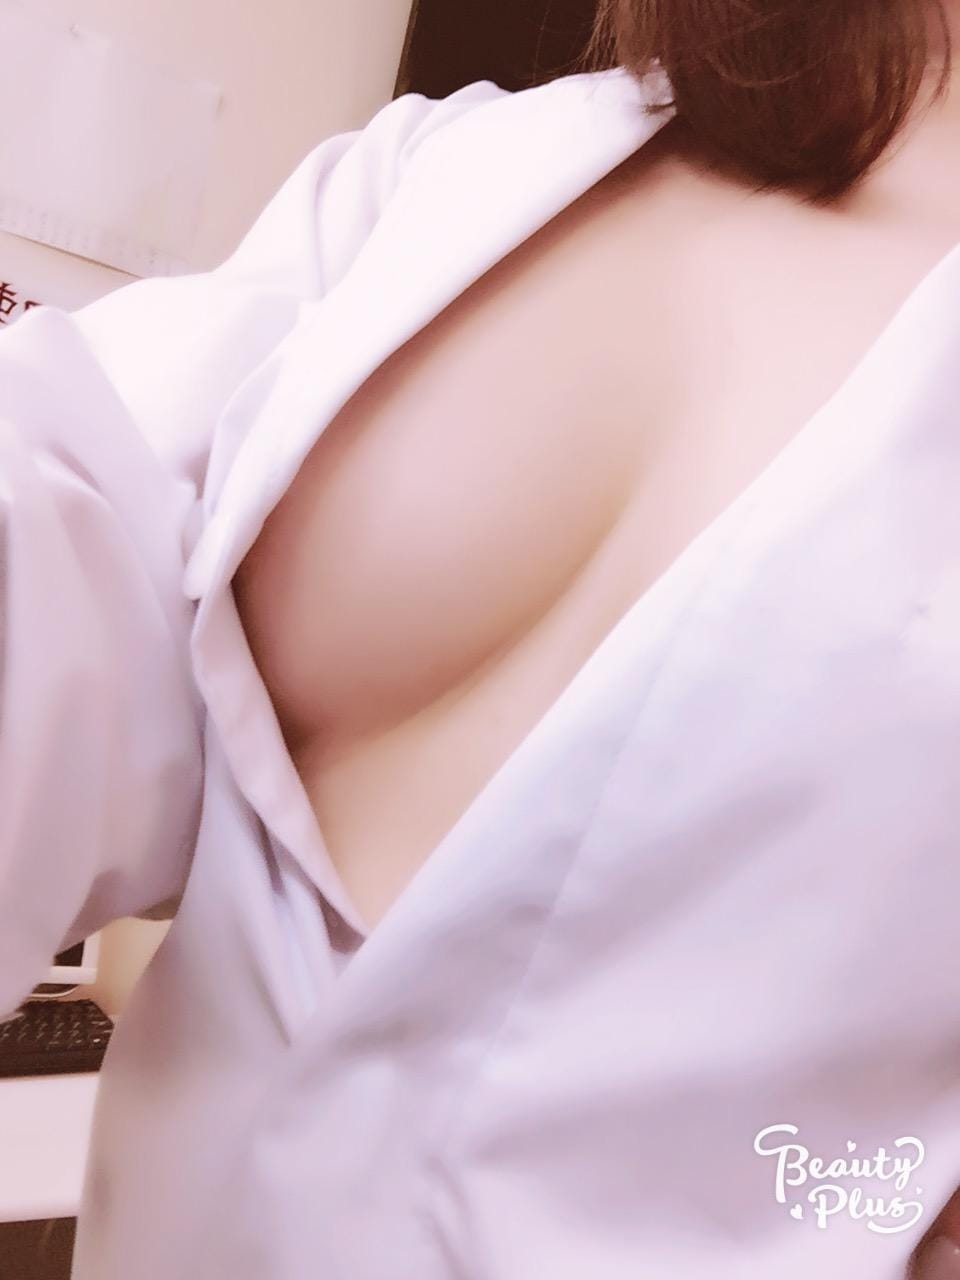 「No56 桐生」10/12(10/12) 16:25 | 桐崎の写メ・風俗動画